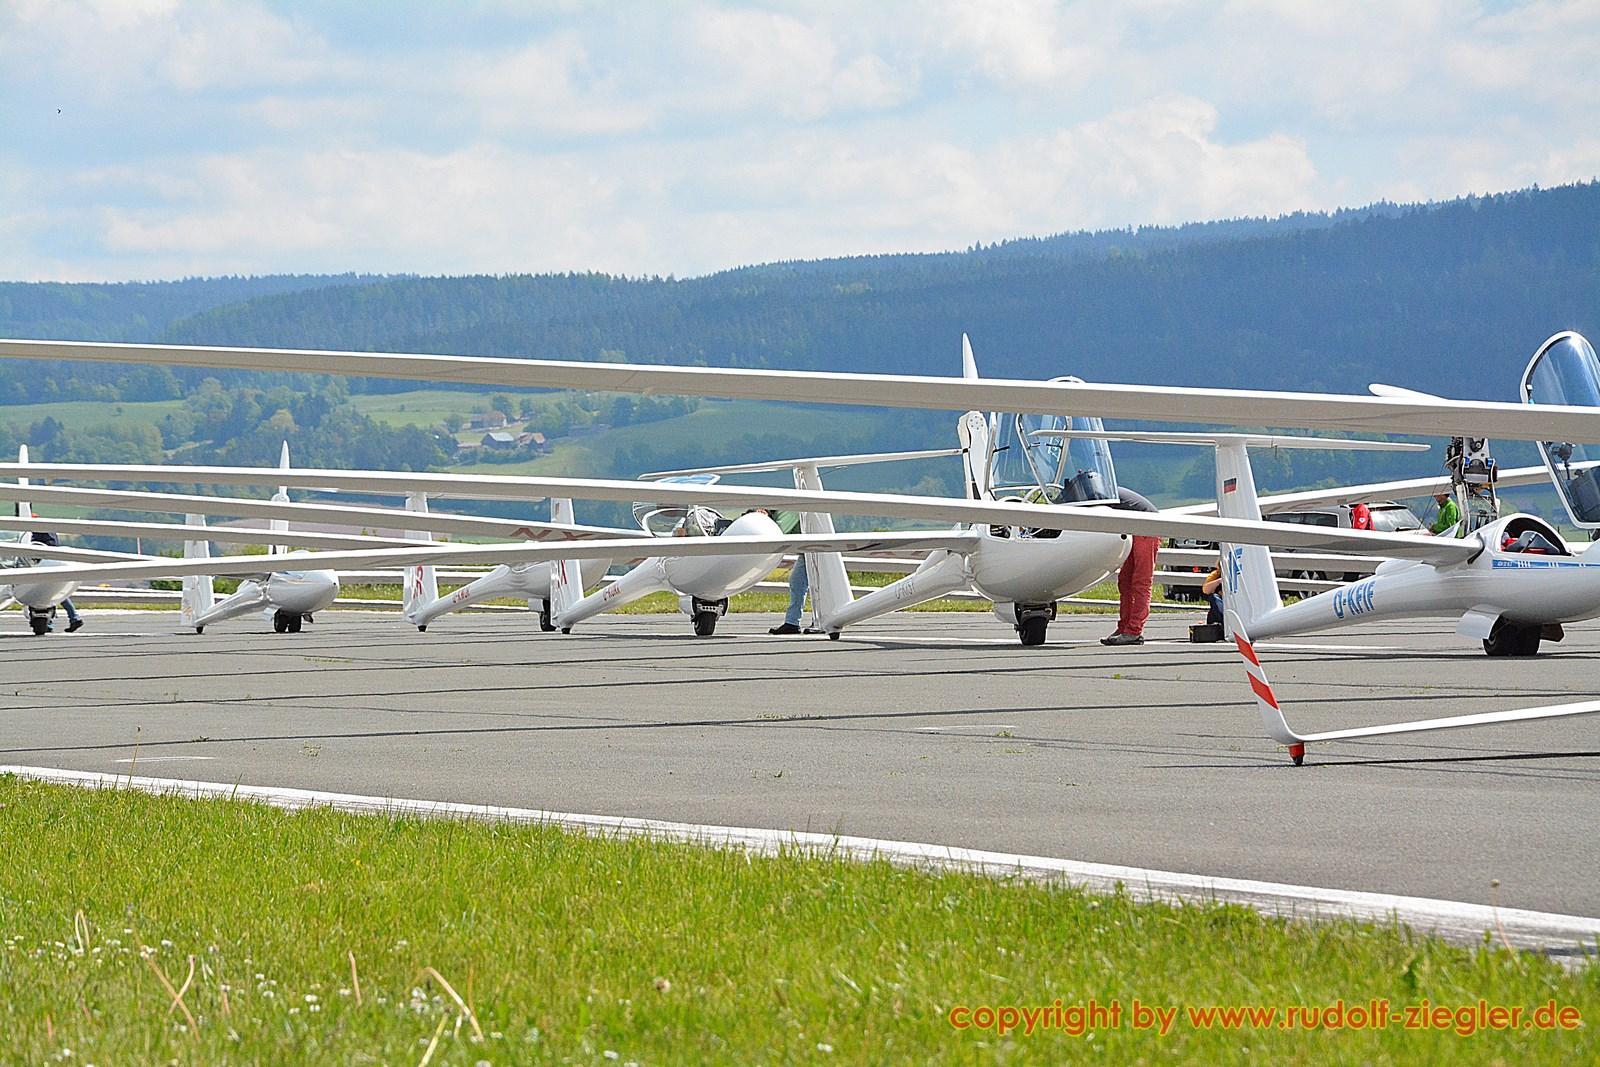 Bayerische Segelflugmeisterschaften - Flugplatz Bindlach 017-S (1600x1200)